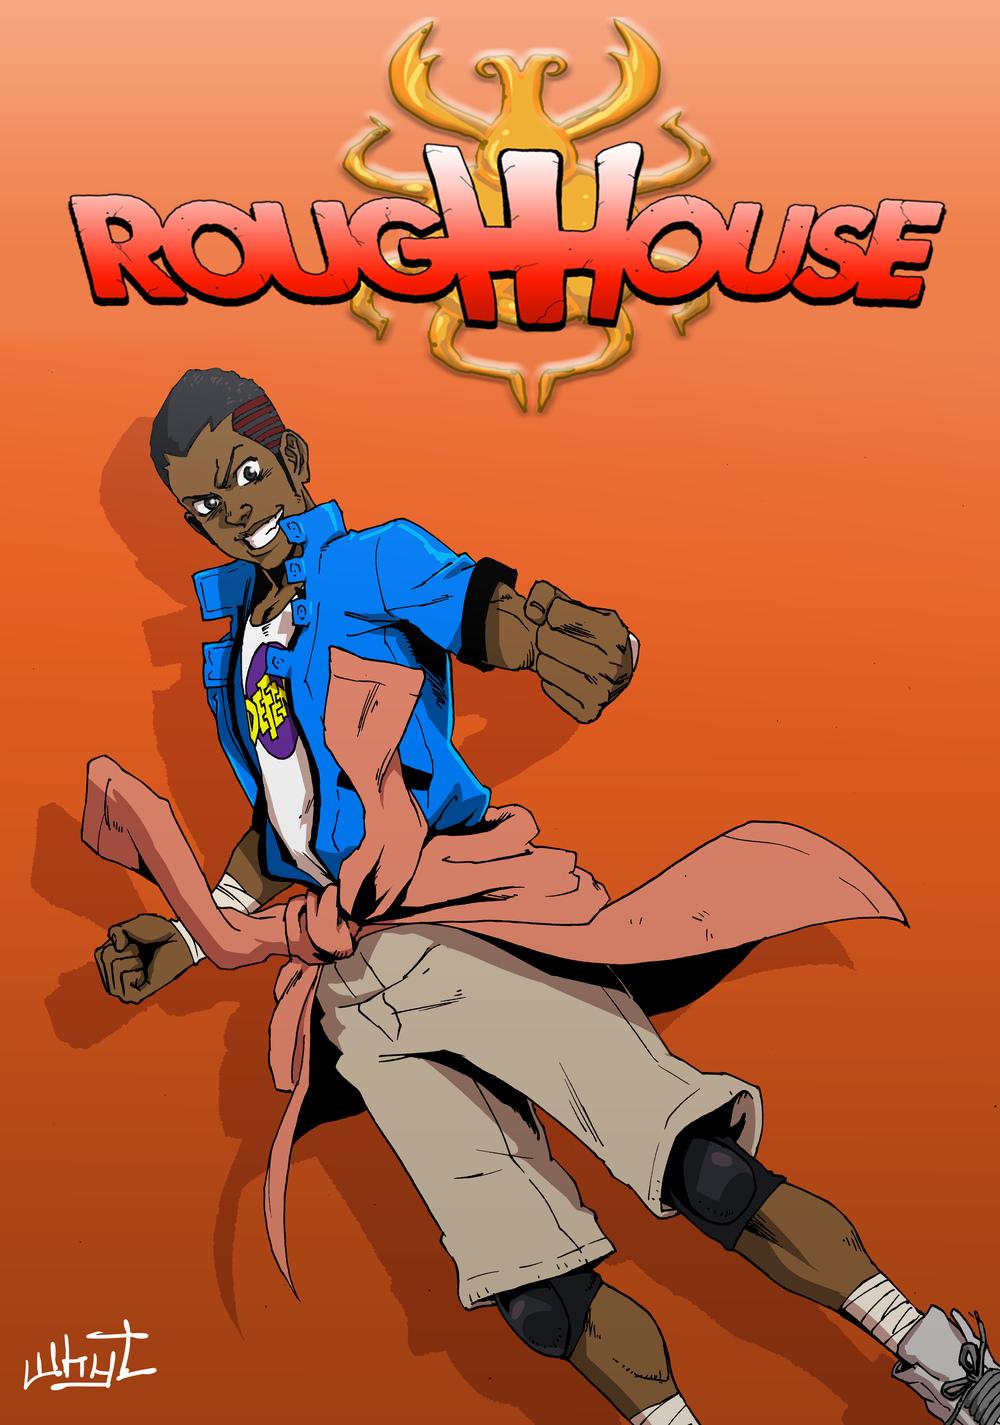 ROUGH HOUSE art by Whyt Manga, ROUGH HOUSE (c) Jordan Cook 2014